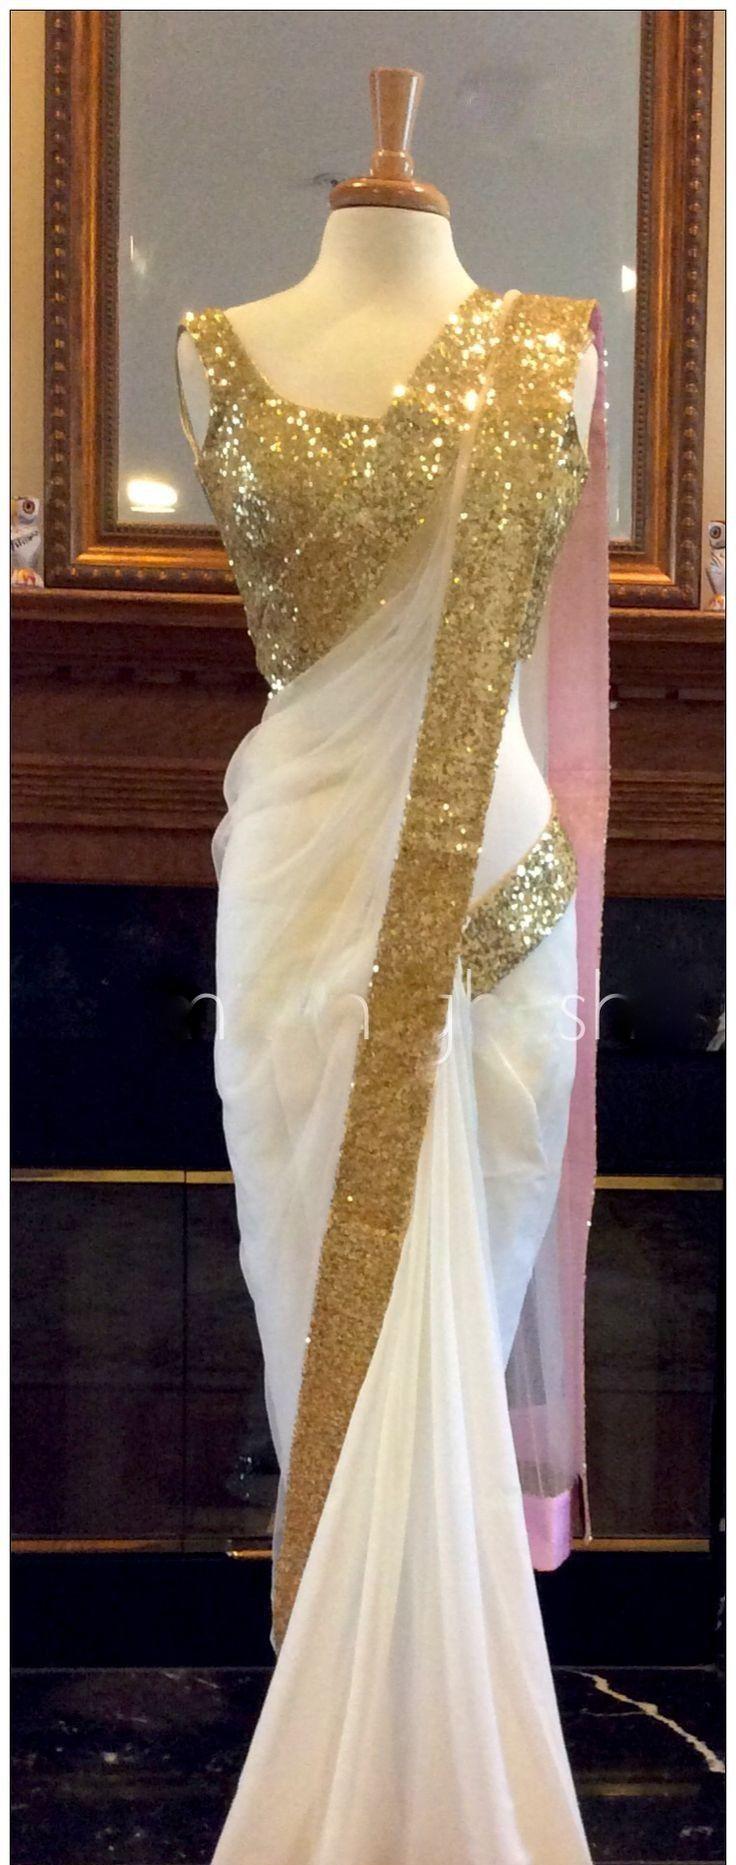 Red Georgette Saree With Golden Border|Saree|Ethnic Wear